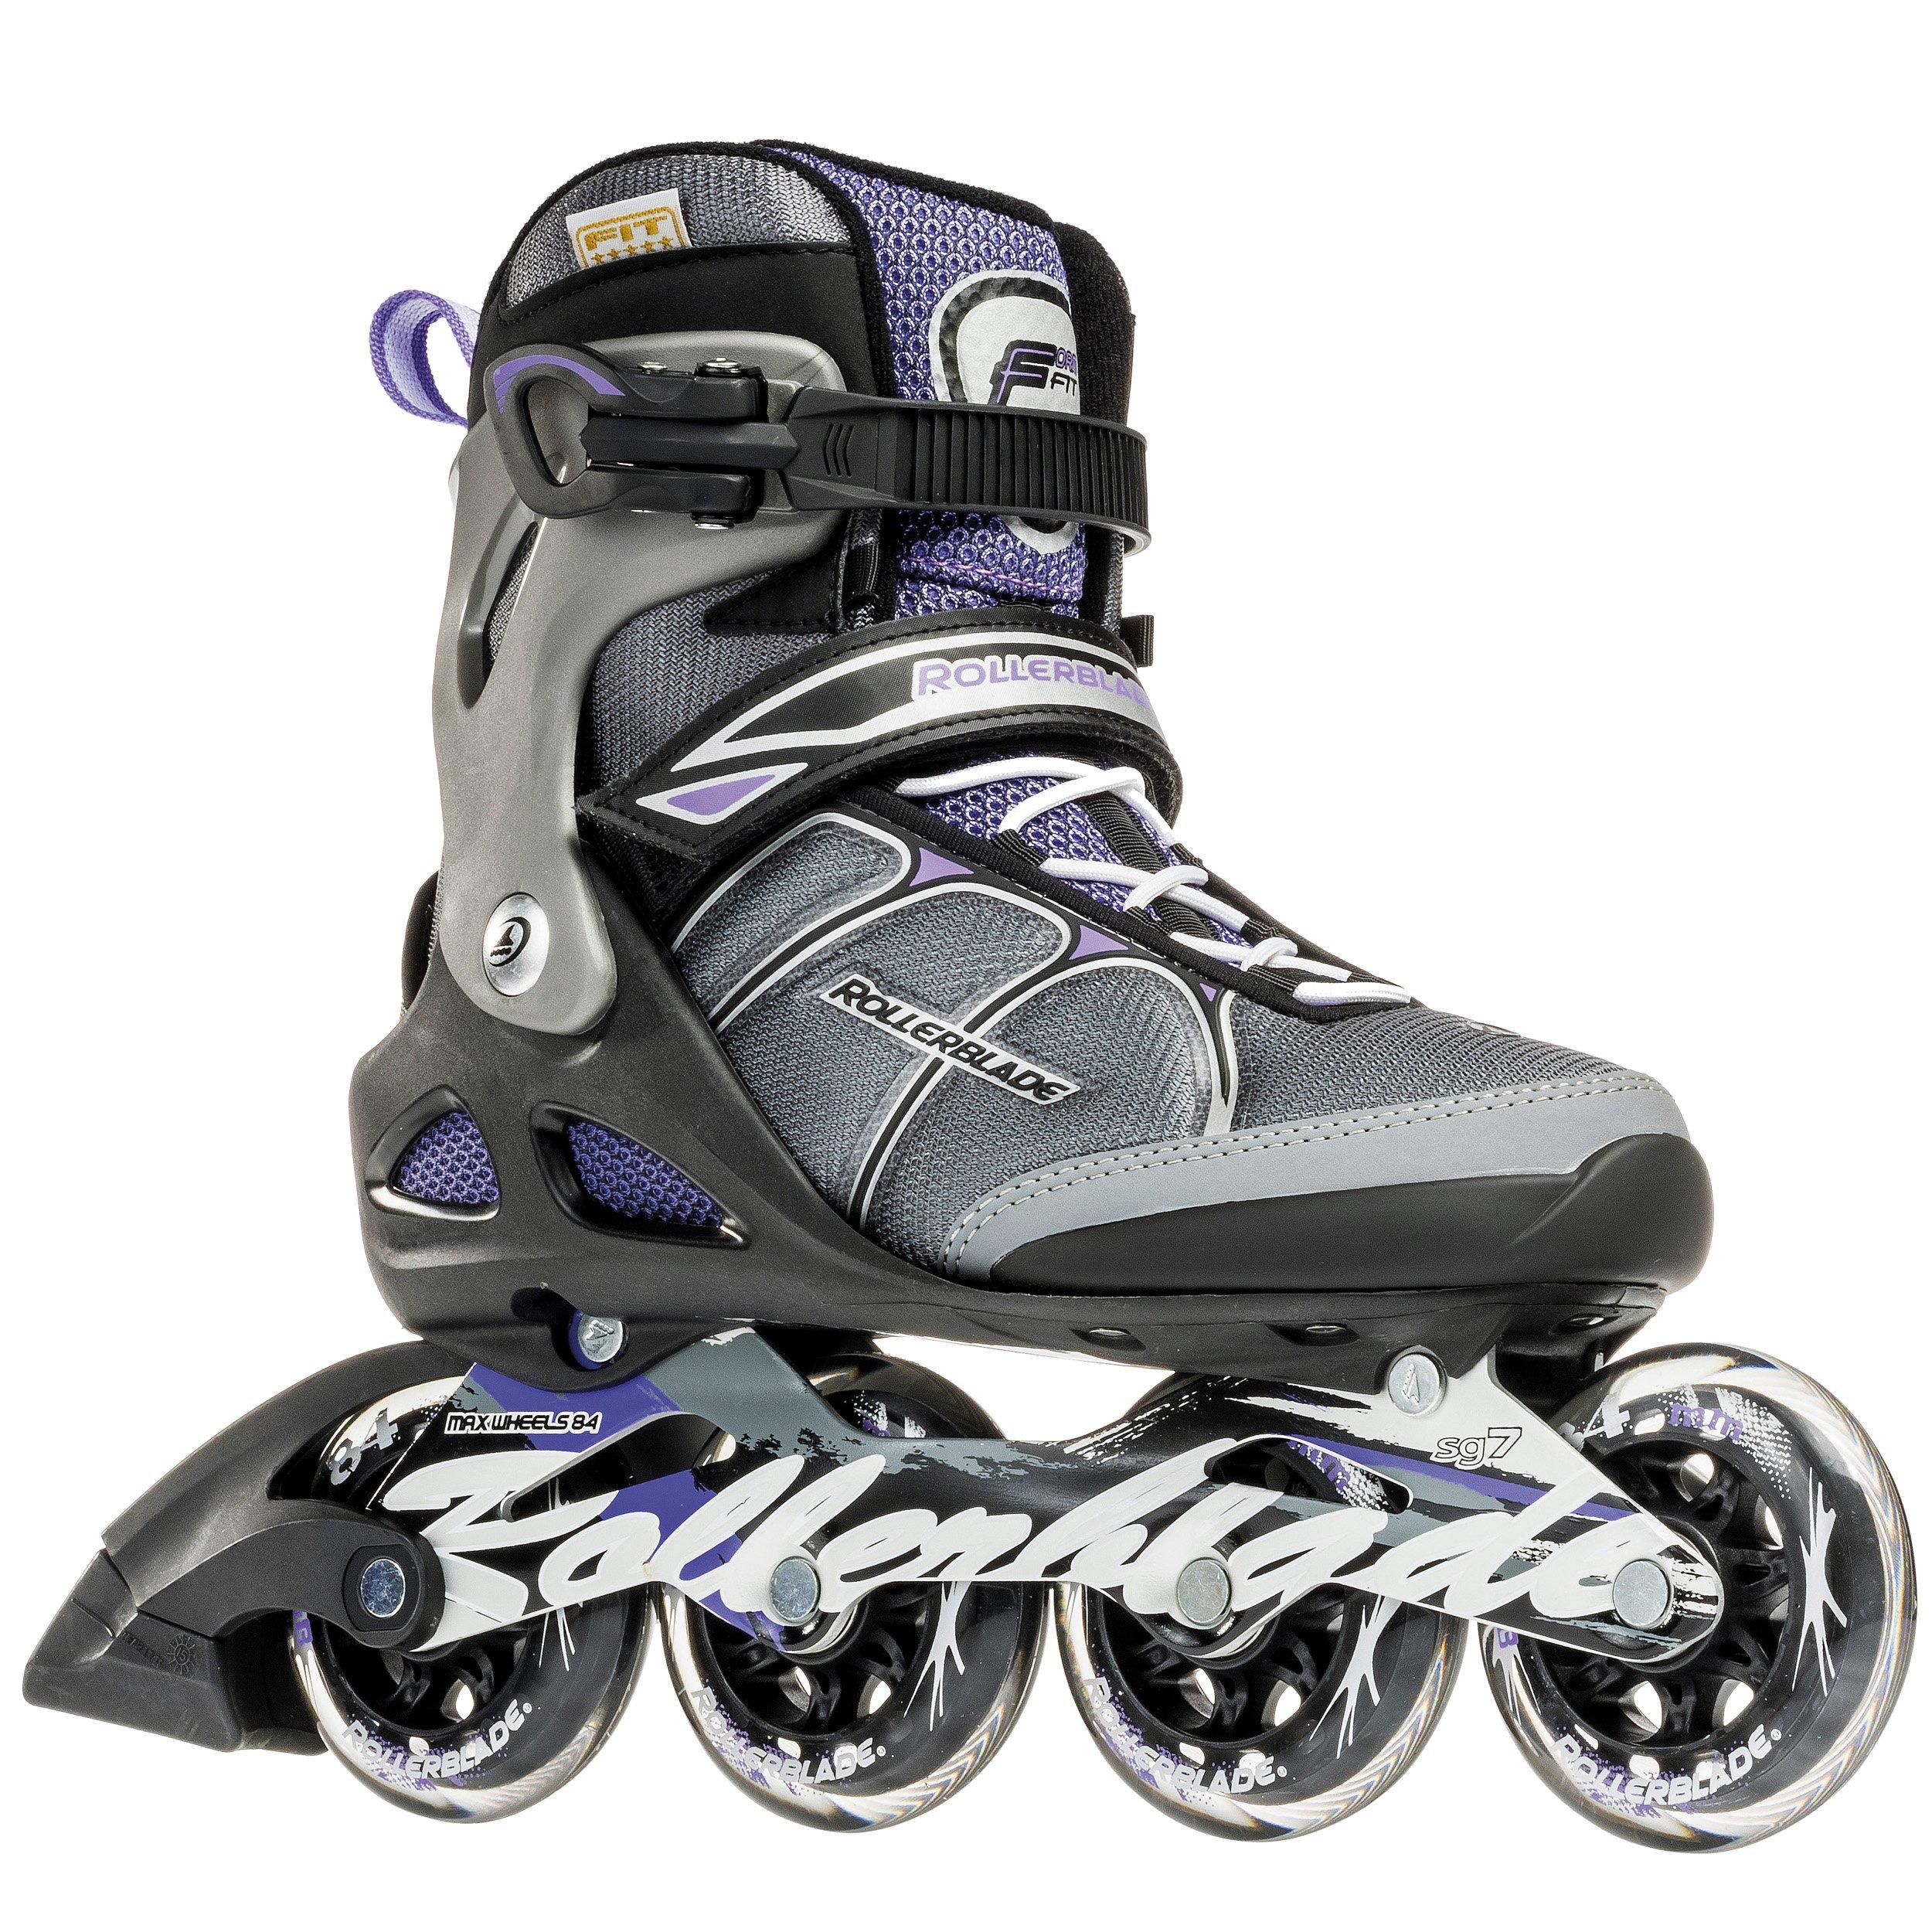 Rollerblade Macroblade 84W Alu 2016 Fitness/Workout Skate, Black/Purple, US Size 9 by Rollerblade